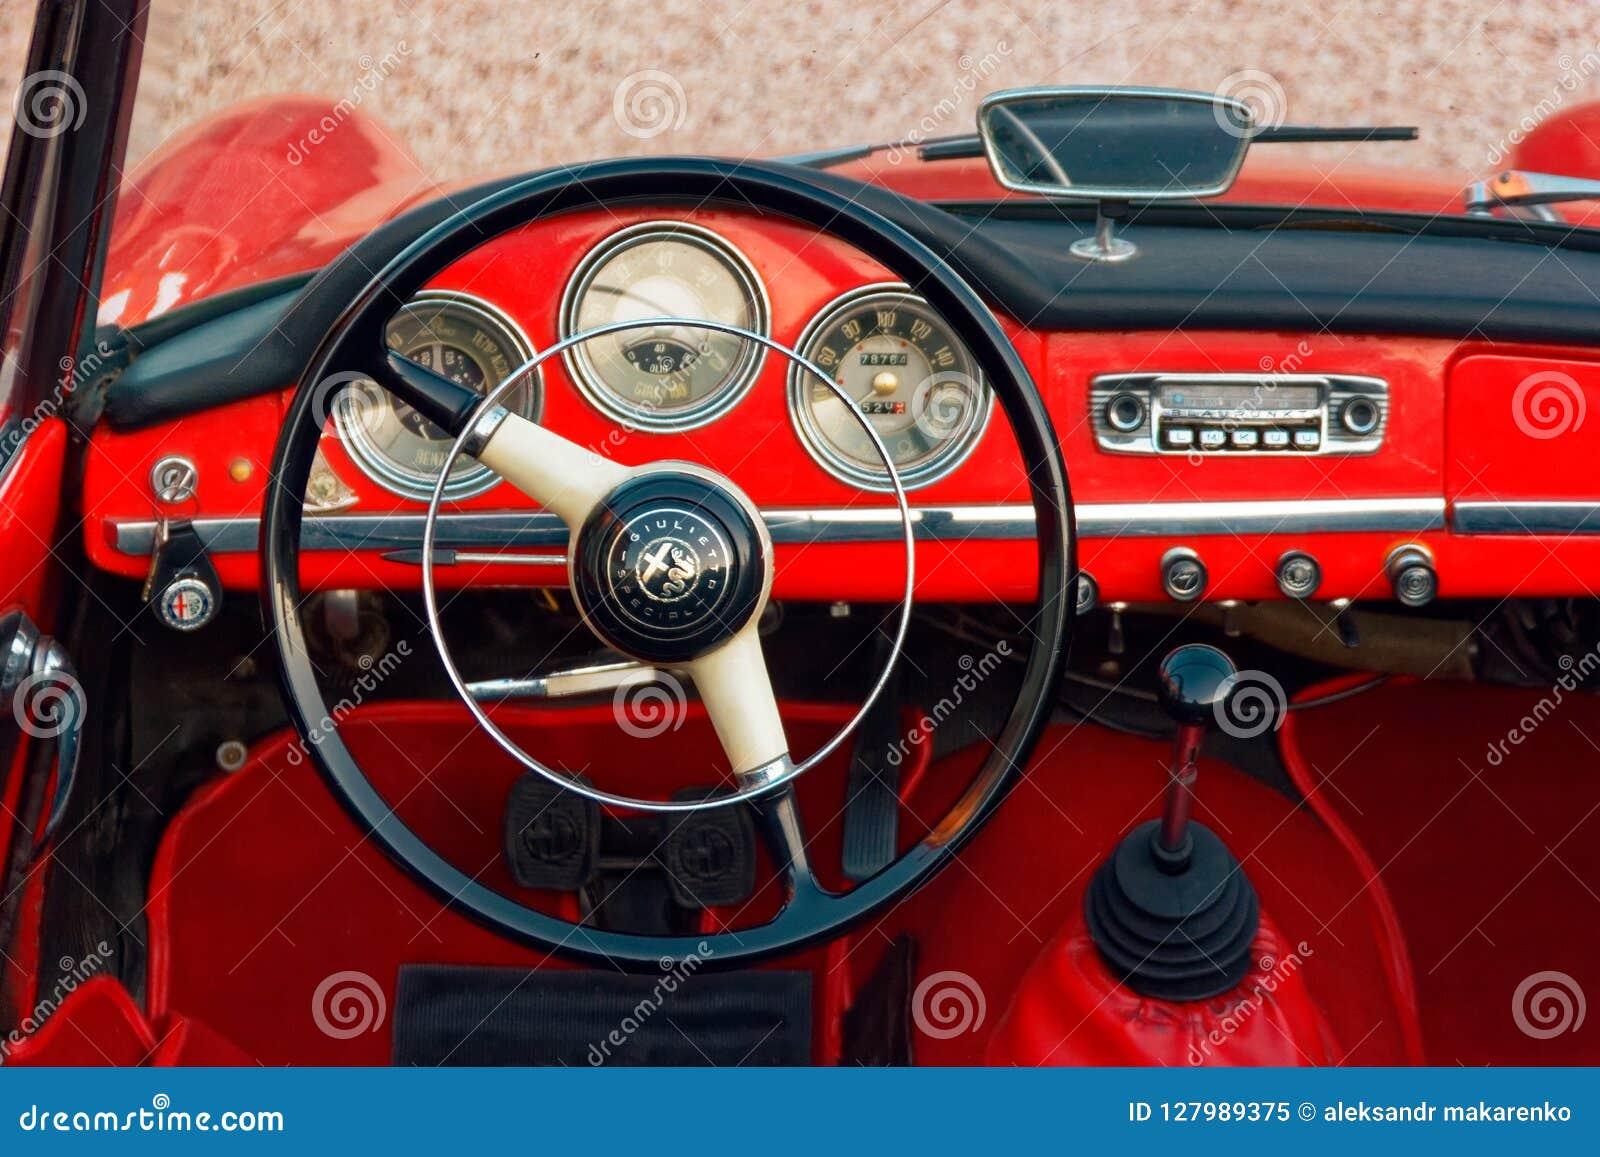 Montagnana Italy August 27 2018 Retro Car Alfa Romeo Convertible